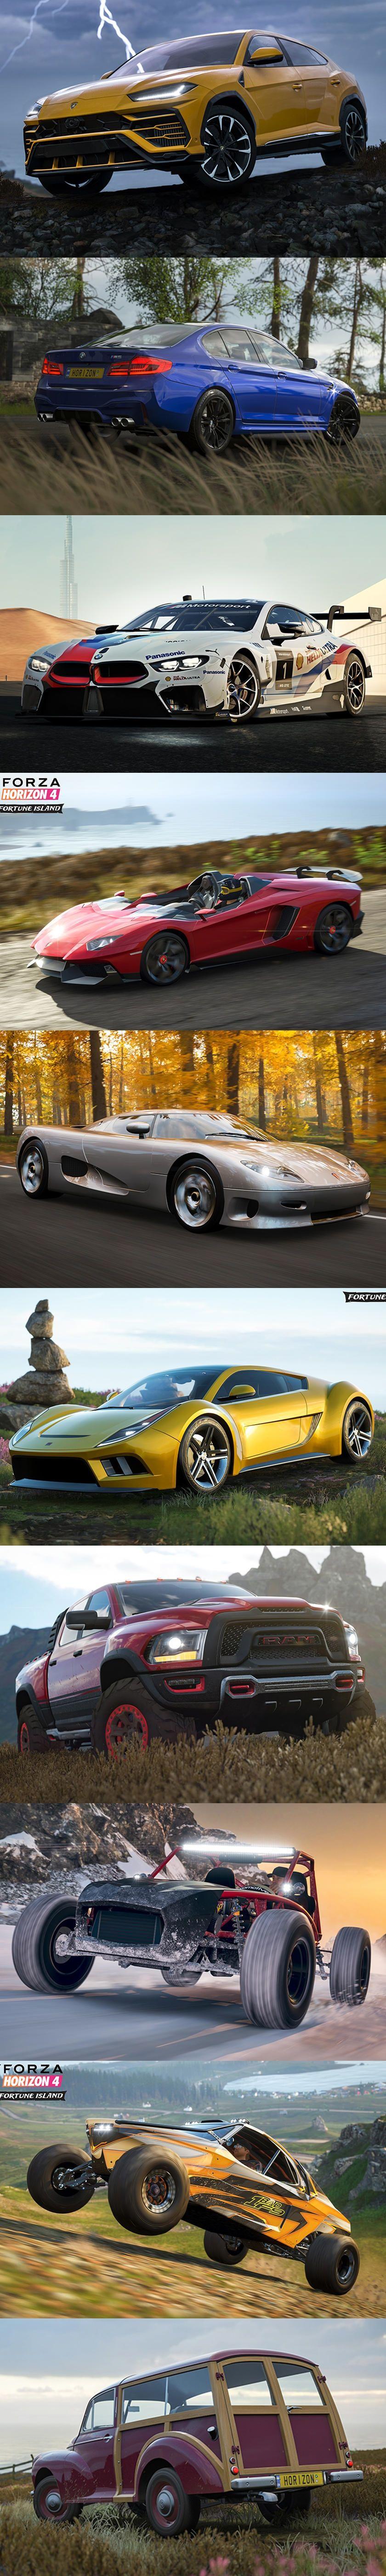 Lambo Urus And Bmw M5 Come To Forza Horizon 4 Forza Horizon 4 Forza Bmw M5